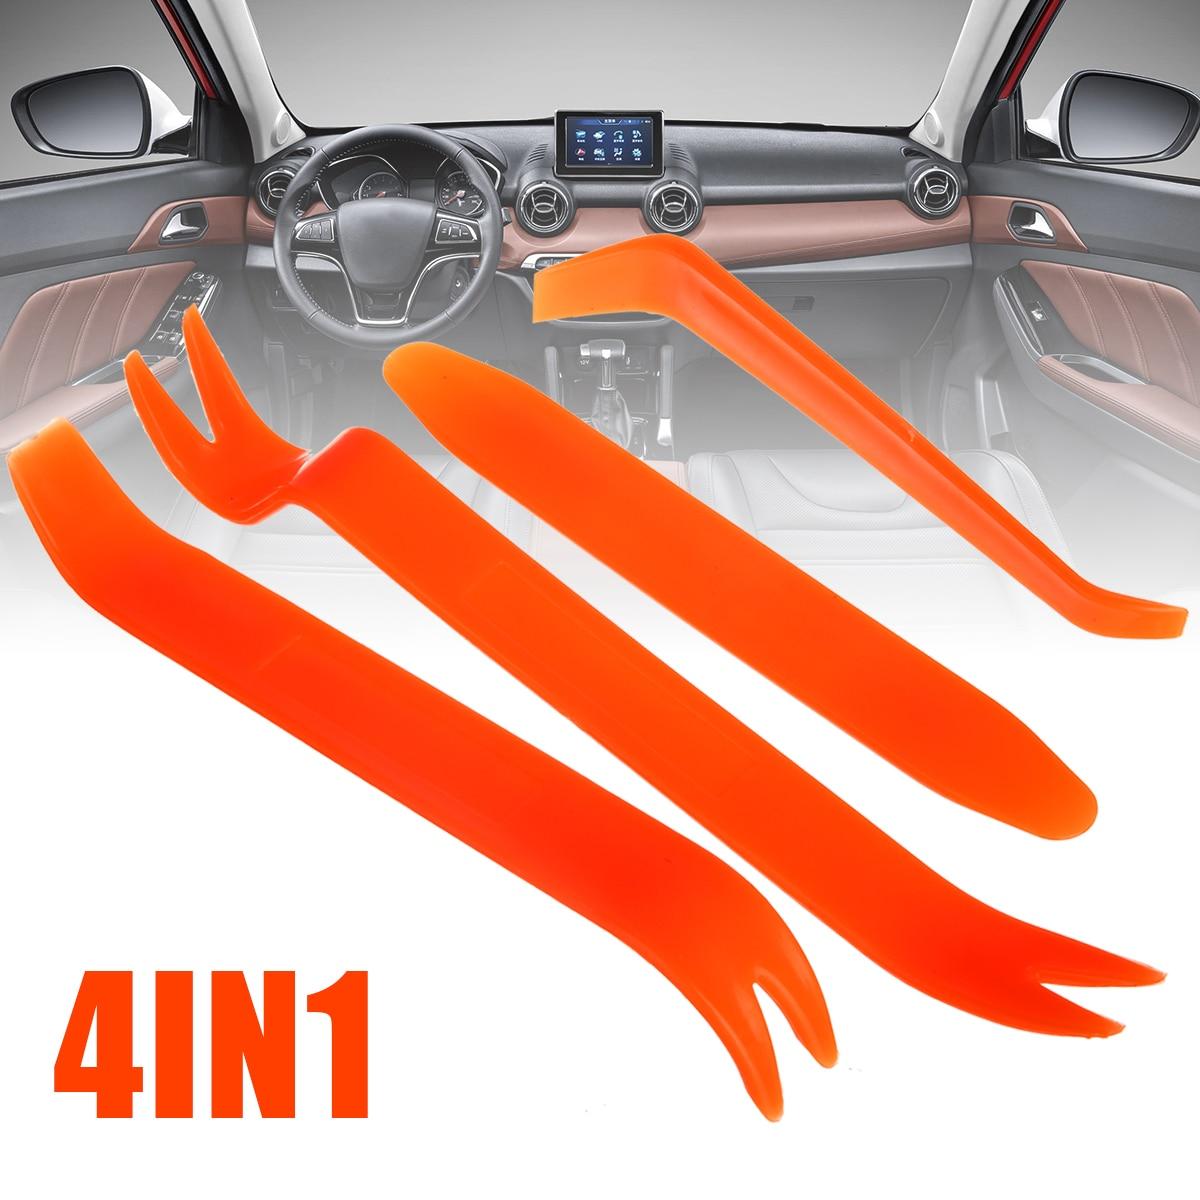 4pcs/set Practical Car Door Panel Audio Dash Trim Clip Pry Removal Install Refit Tool Easily Remove Trim Molding